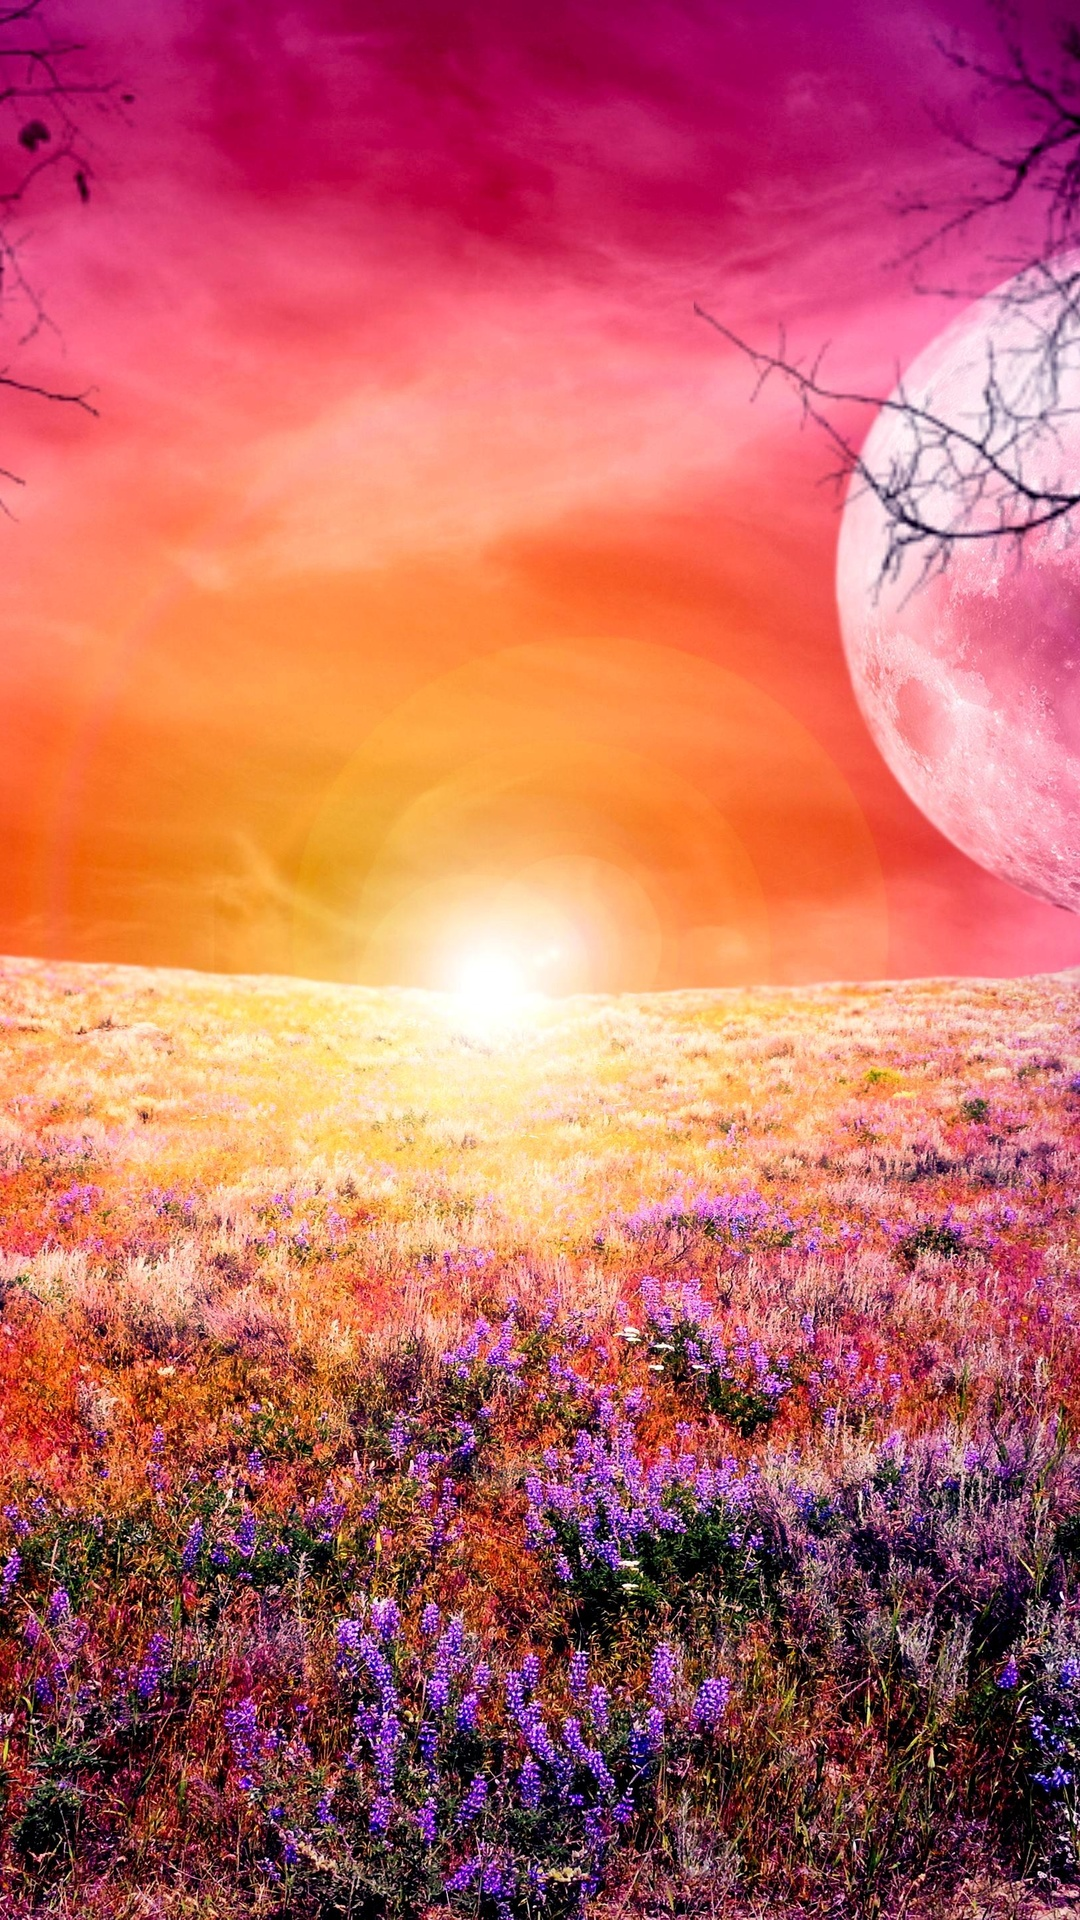 Colorful full moon 4K Ultra HD wallpaper 4k WallpaperNet 1080x1920